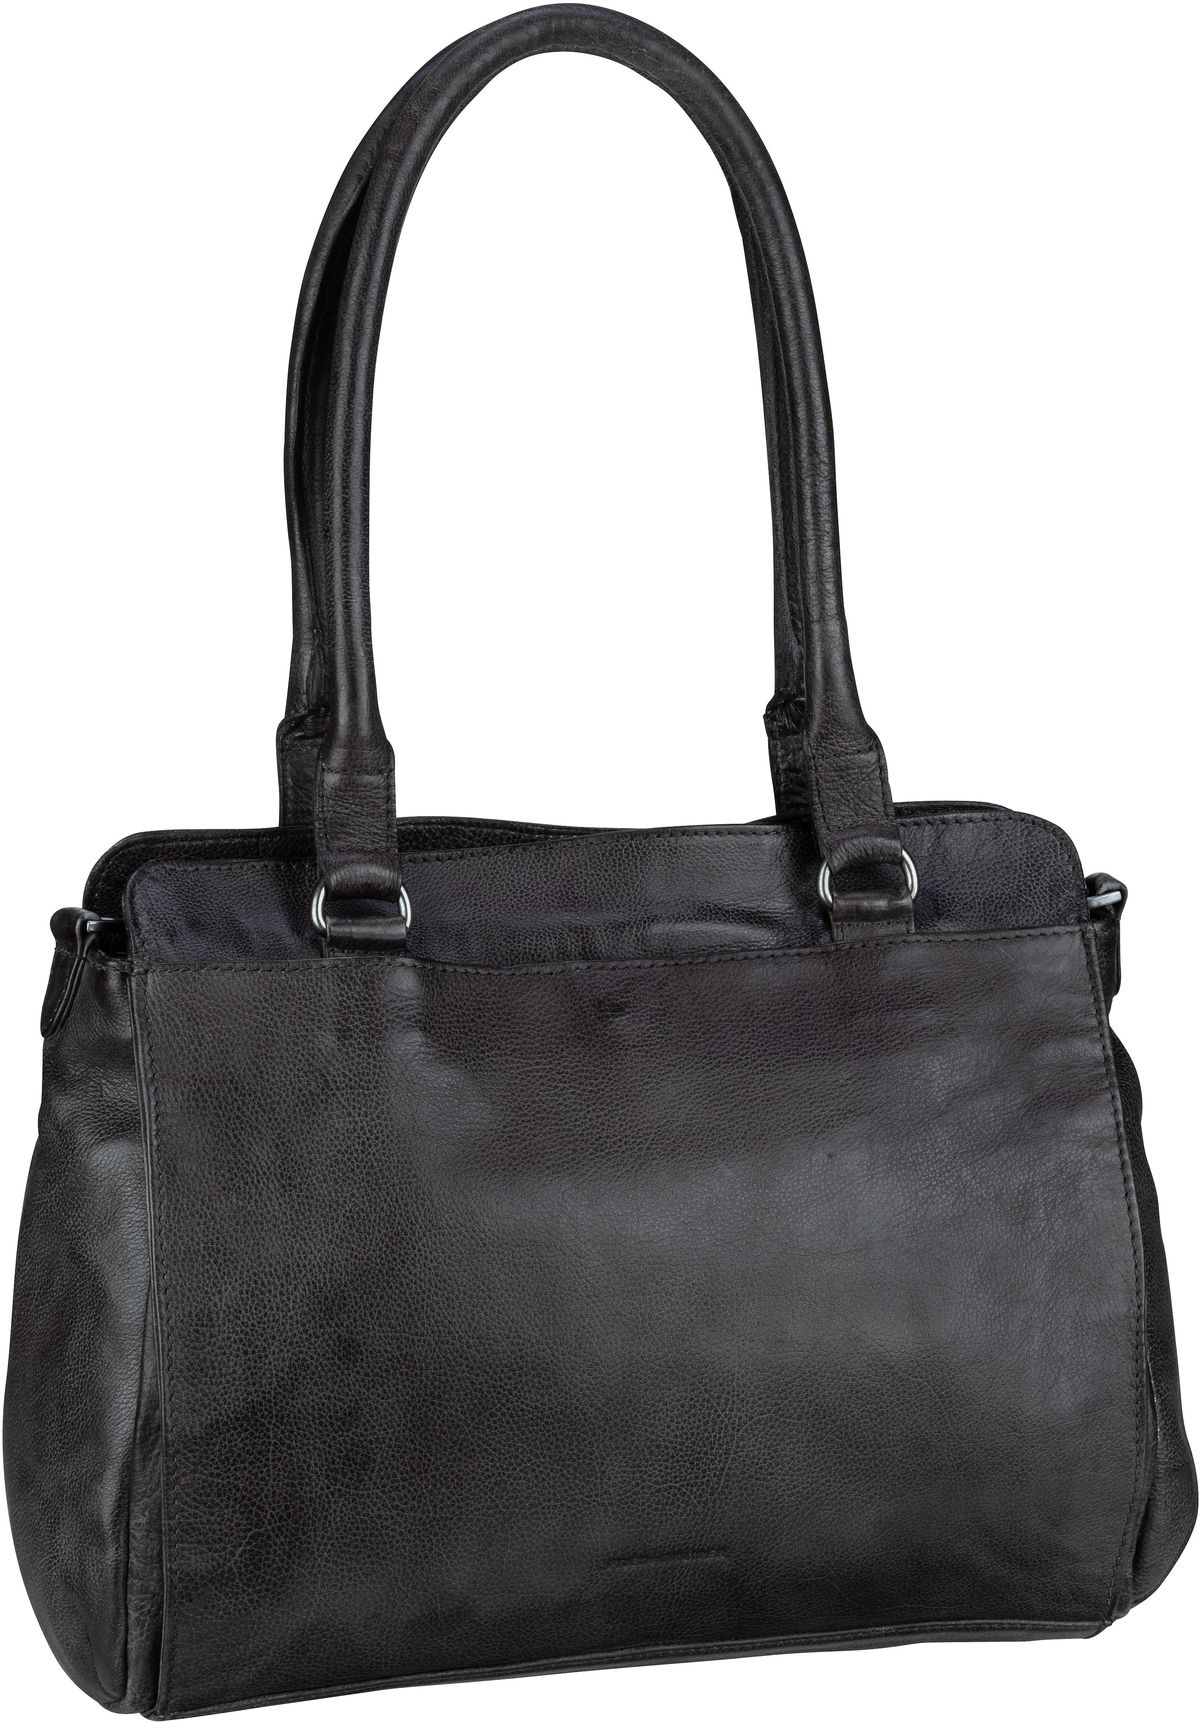 Handtasche Rise Antracite